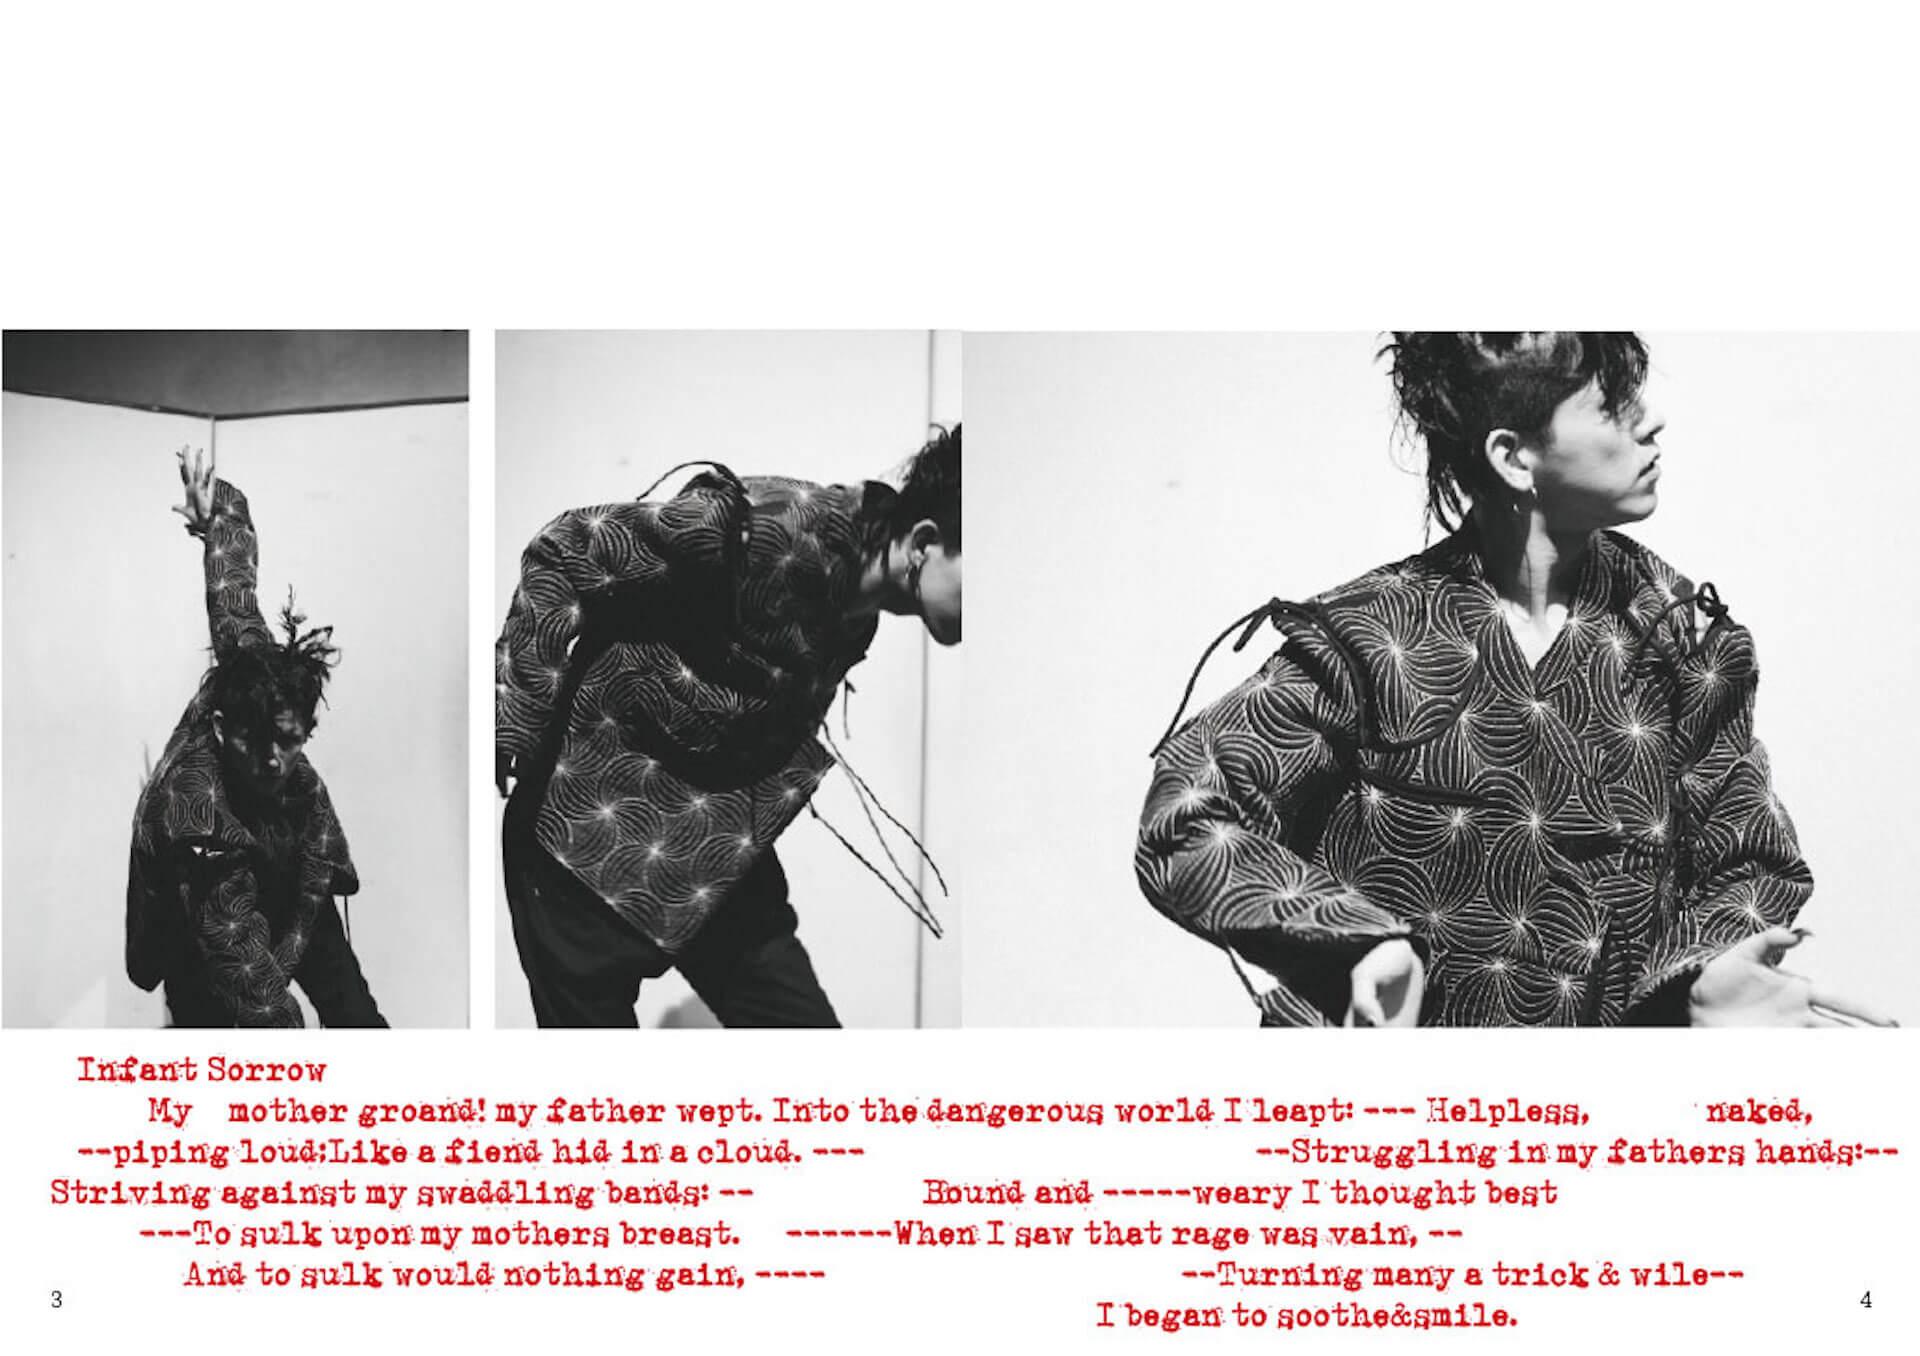 Lehの2020年秋冬コレクションがリリース|イメージモデルに山川冬樹、shimizu mash、elena midoriを起用。コレクションの撮影は水谷太郎。 life_fashion200913-leh-romantic-1